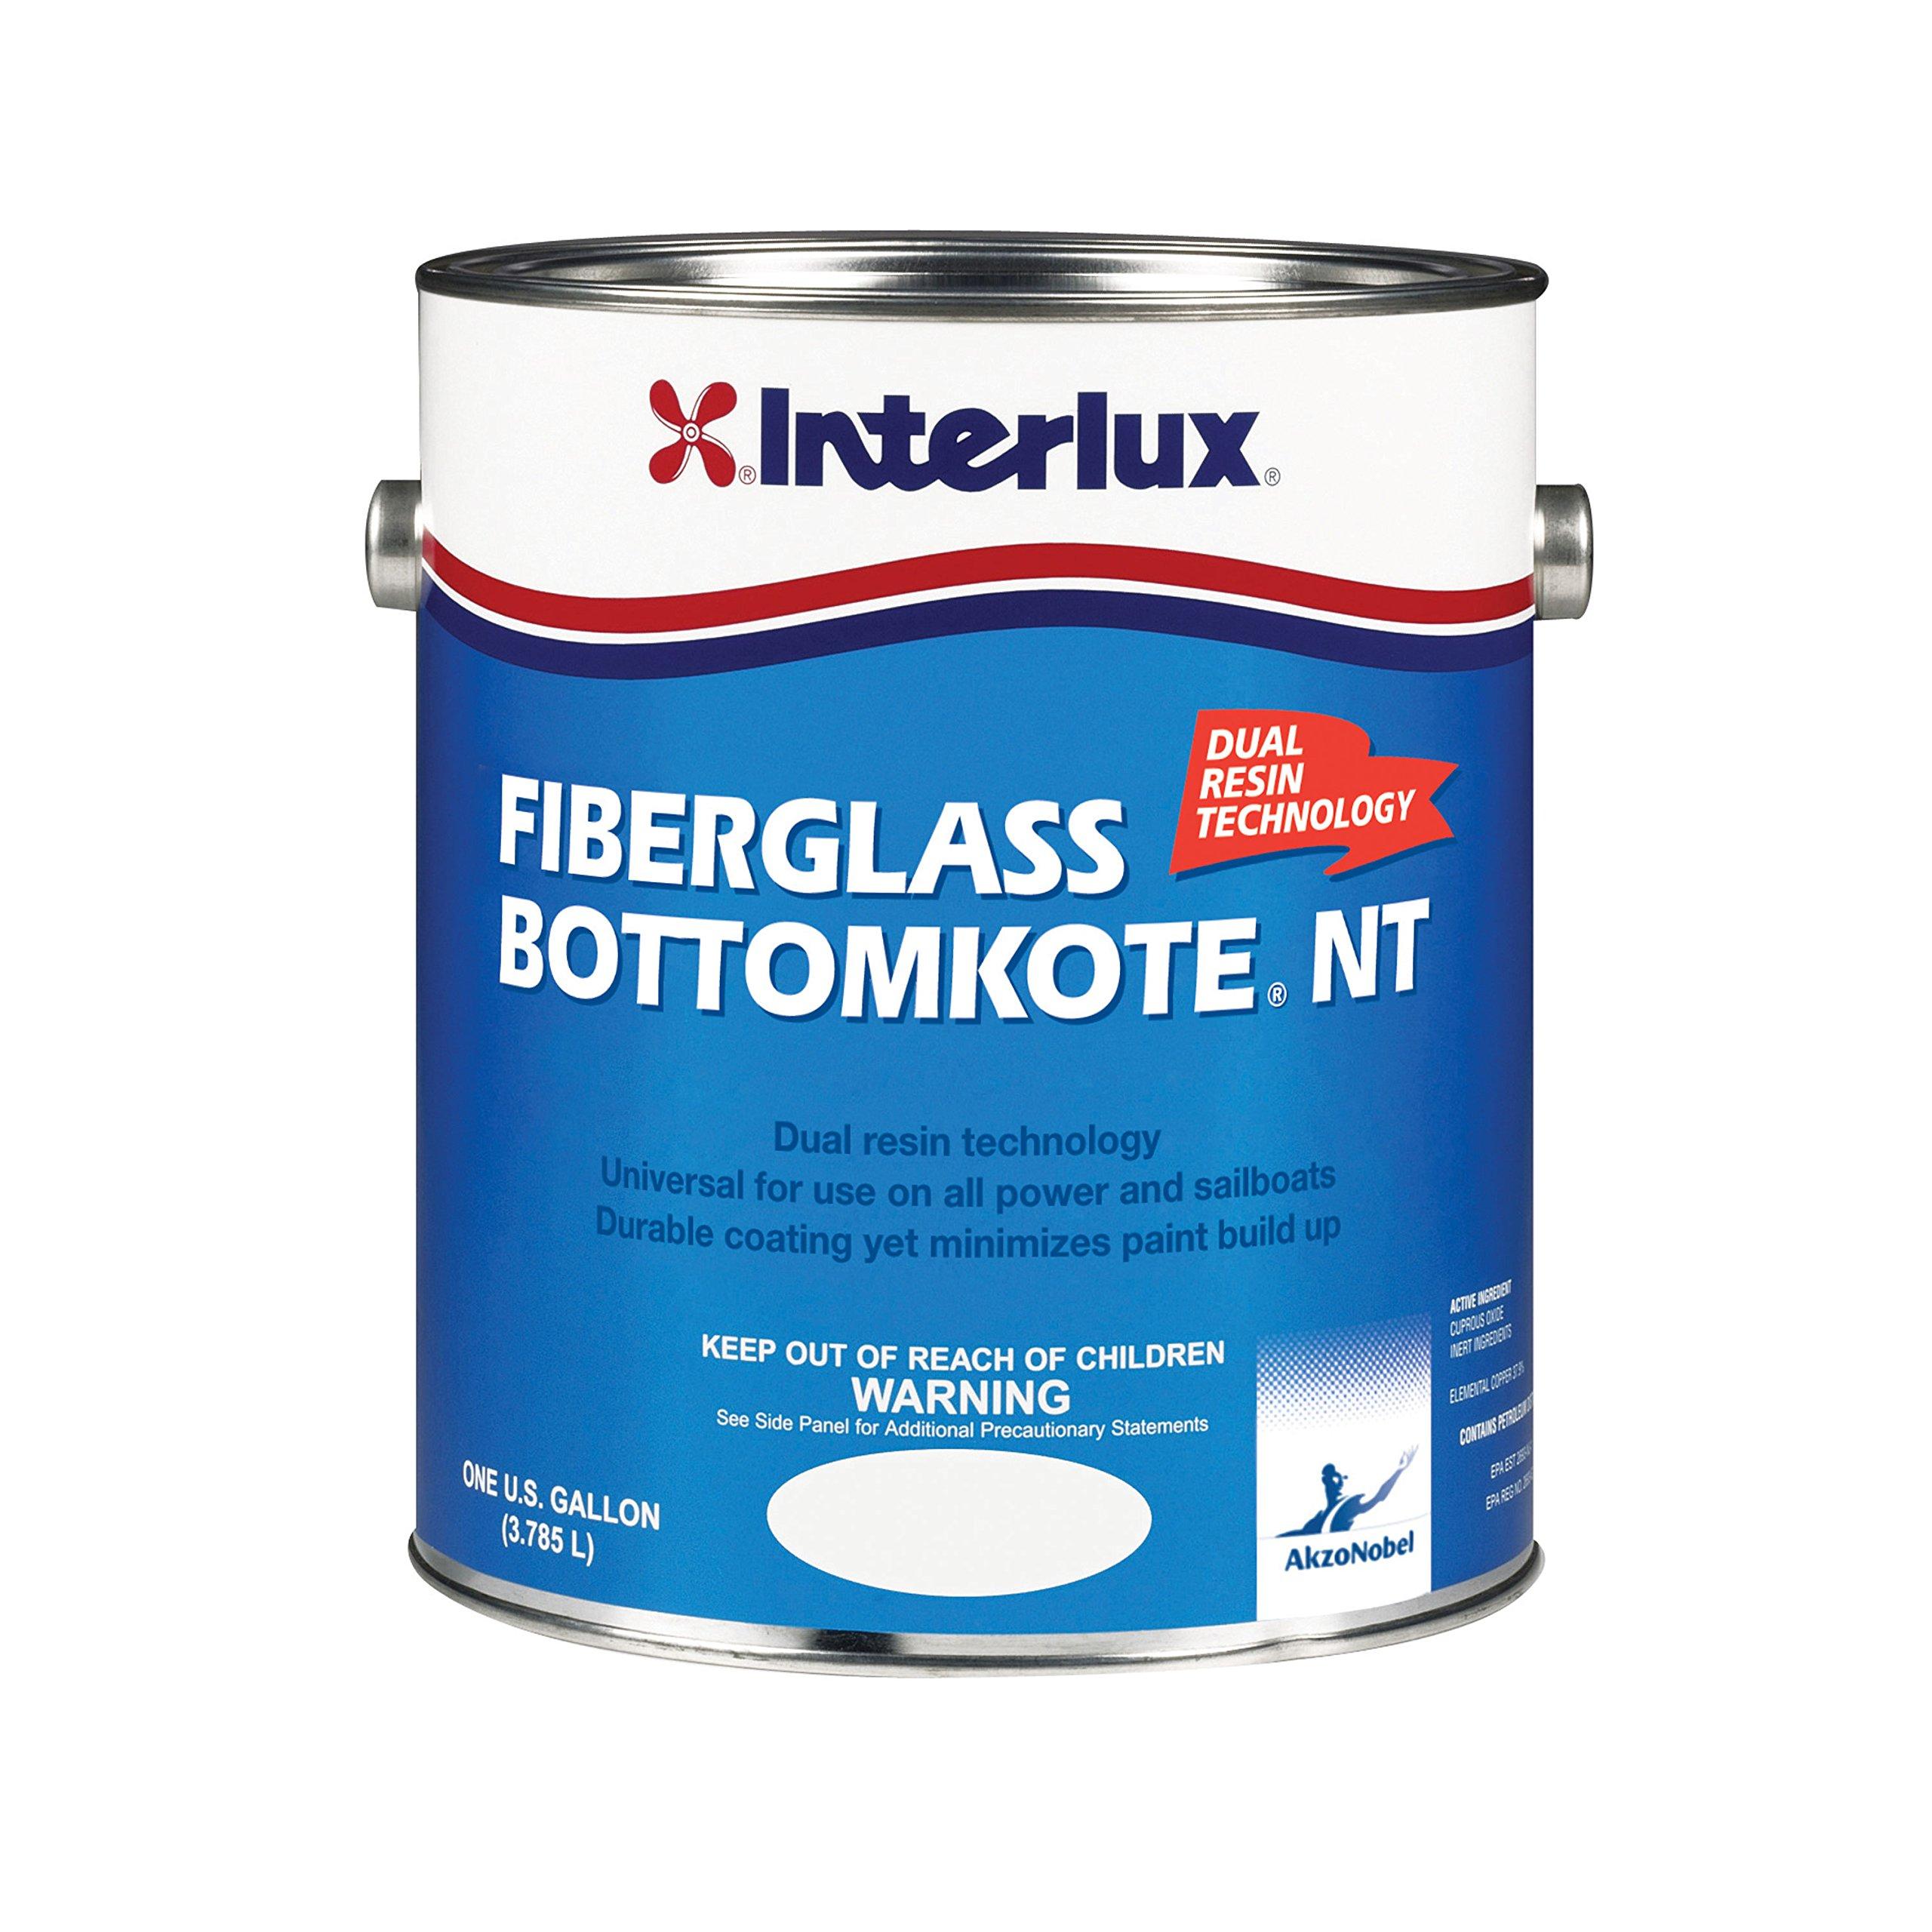 Interlux YBB349 Fiberglass Antifouling Fluid_Ounces